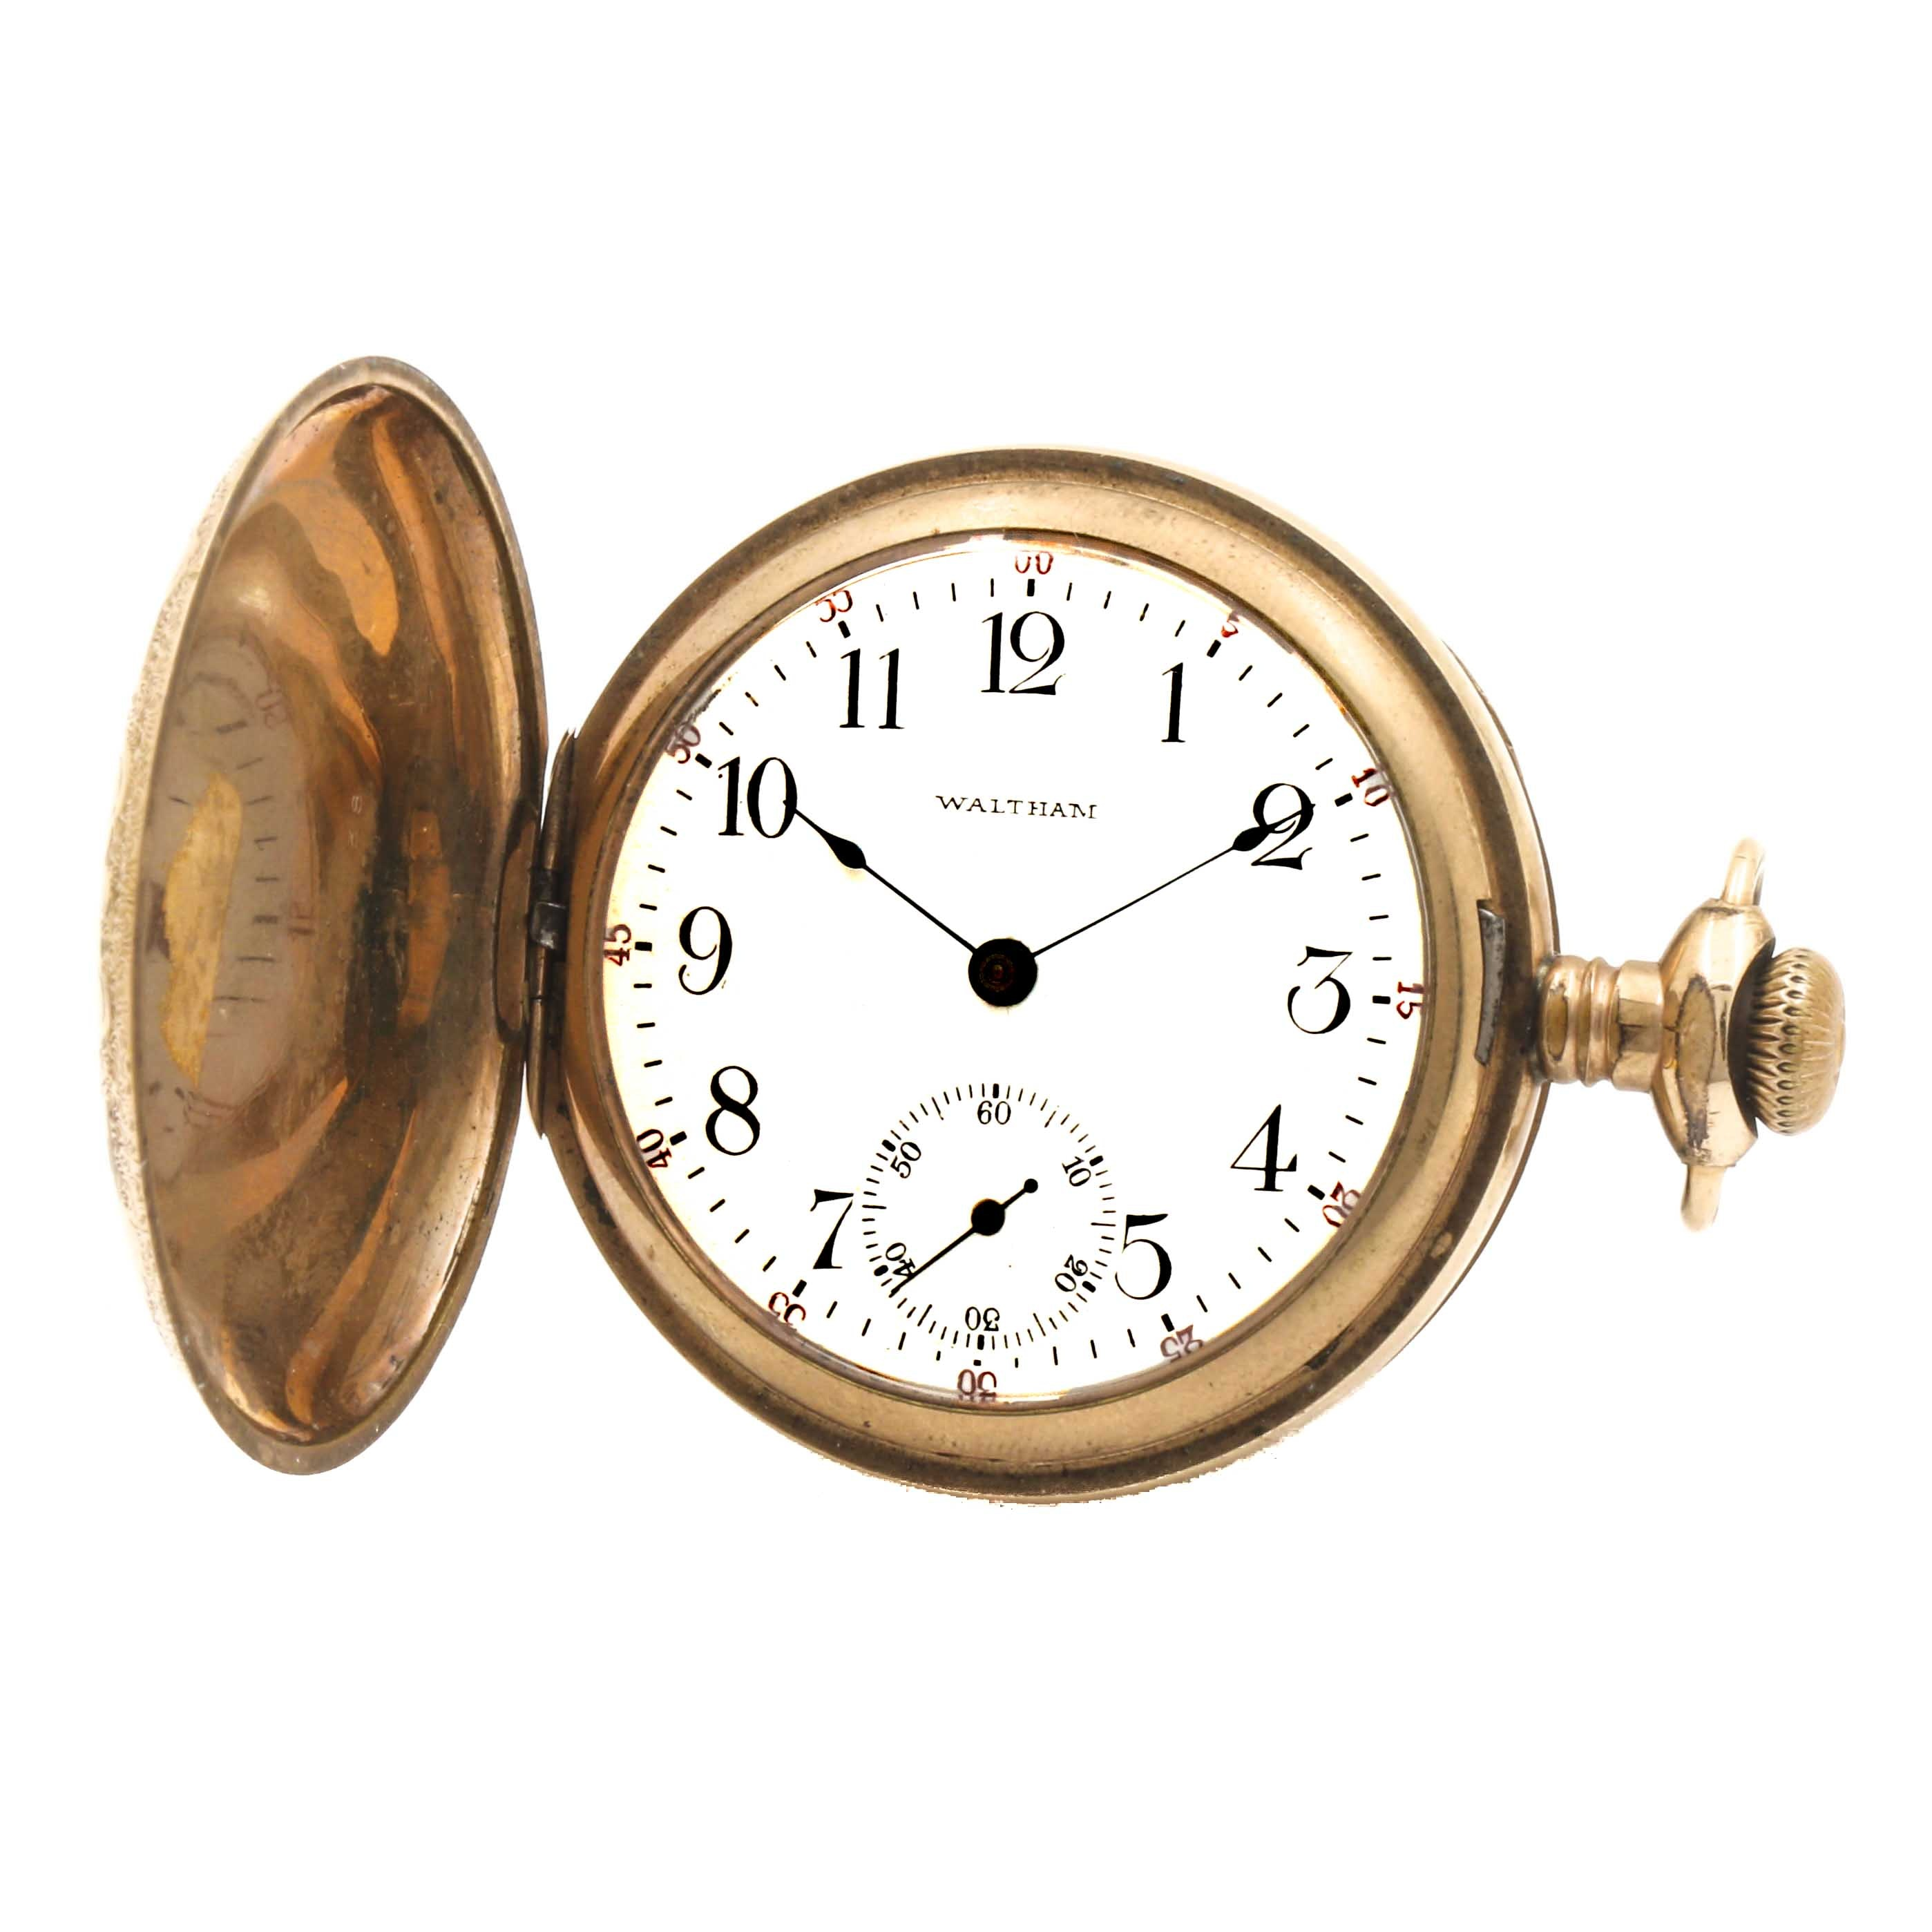 Antique Waltham Hunting Case Pocket Watch